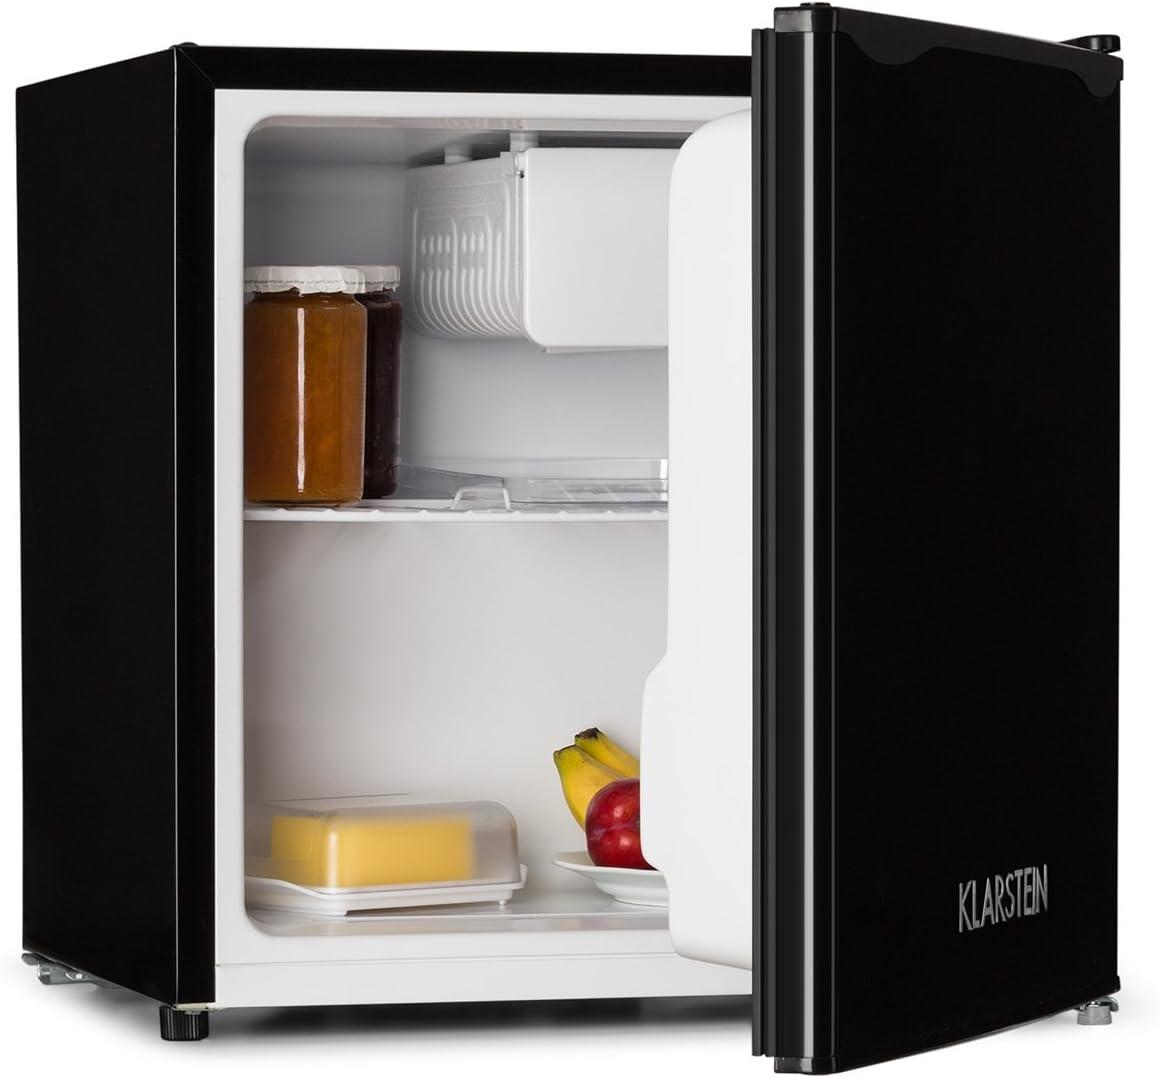 Klarstein KS50-A - Minibar, Mini Nevera, Nevera para Bebidas, A + ...